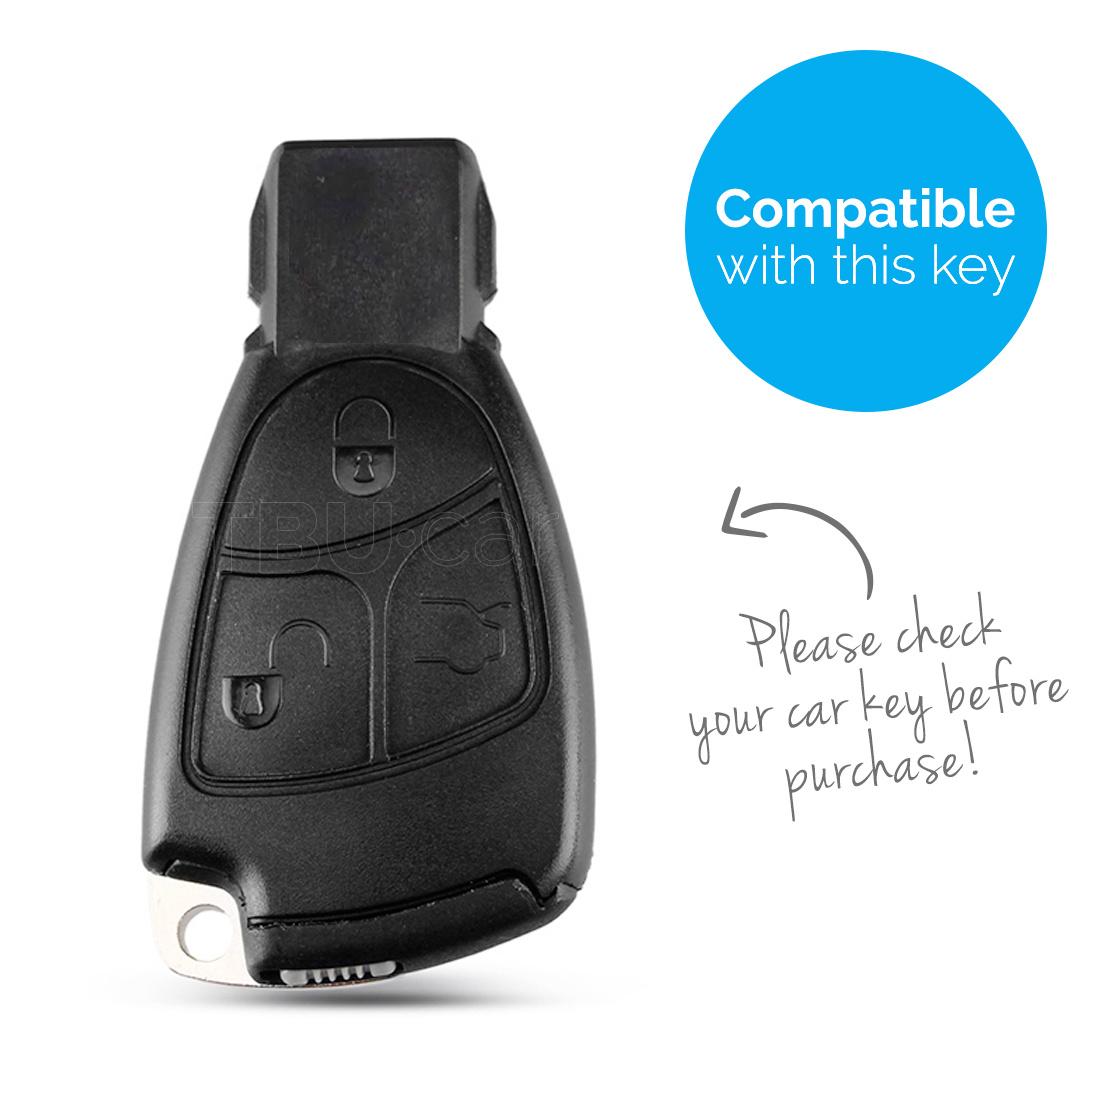 TBU car TBU car Autoschlüssel Hülle kompatibel mit Mercedes 3 Tasten - Schutzhülle aus Silikon - Auto Schlüsselhülle Cover in Schwarz